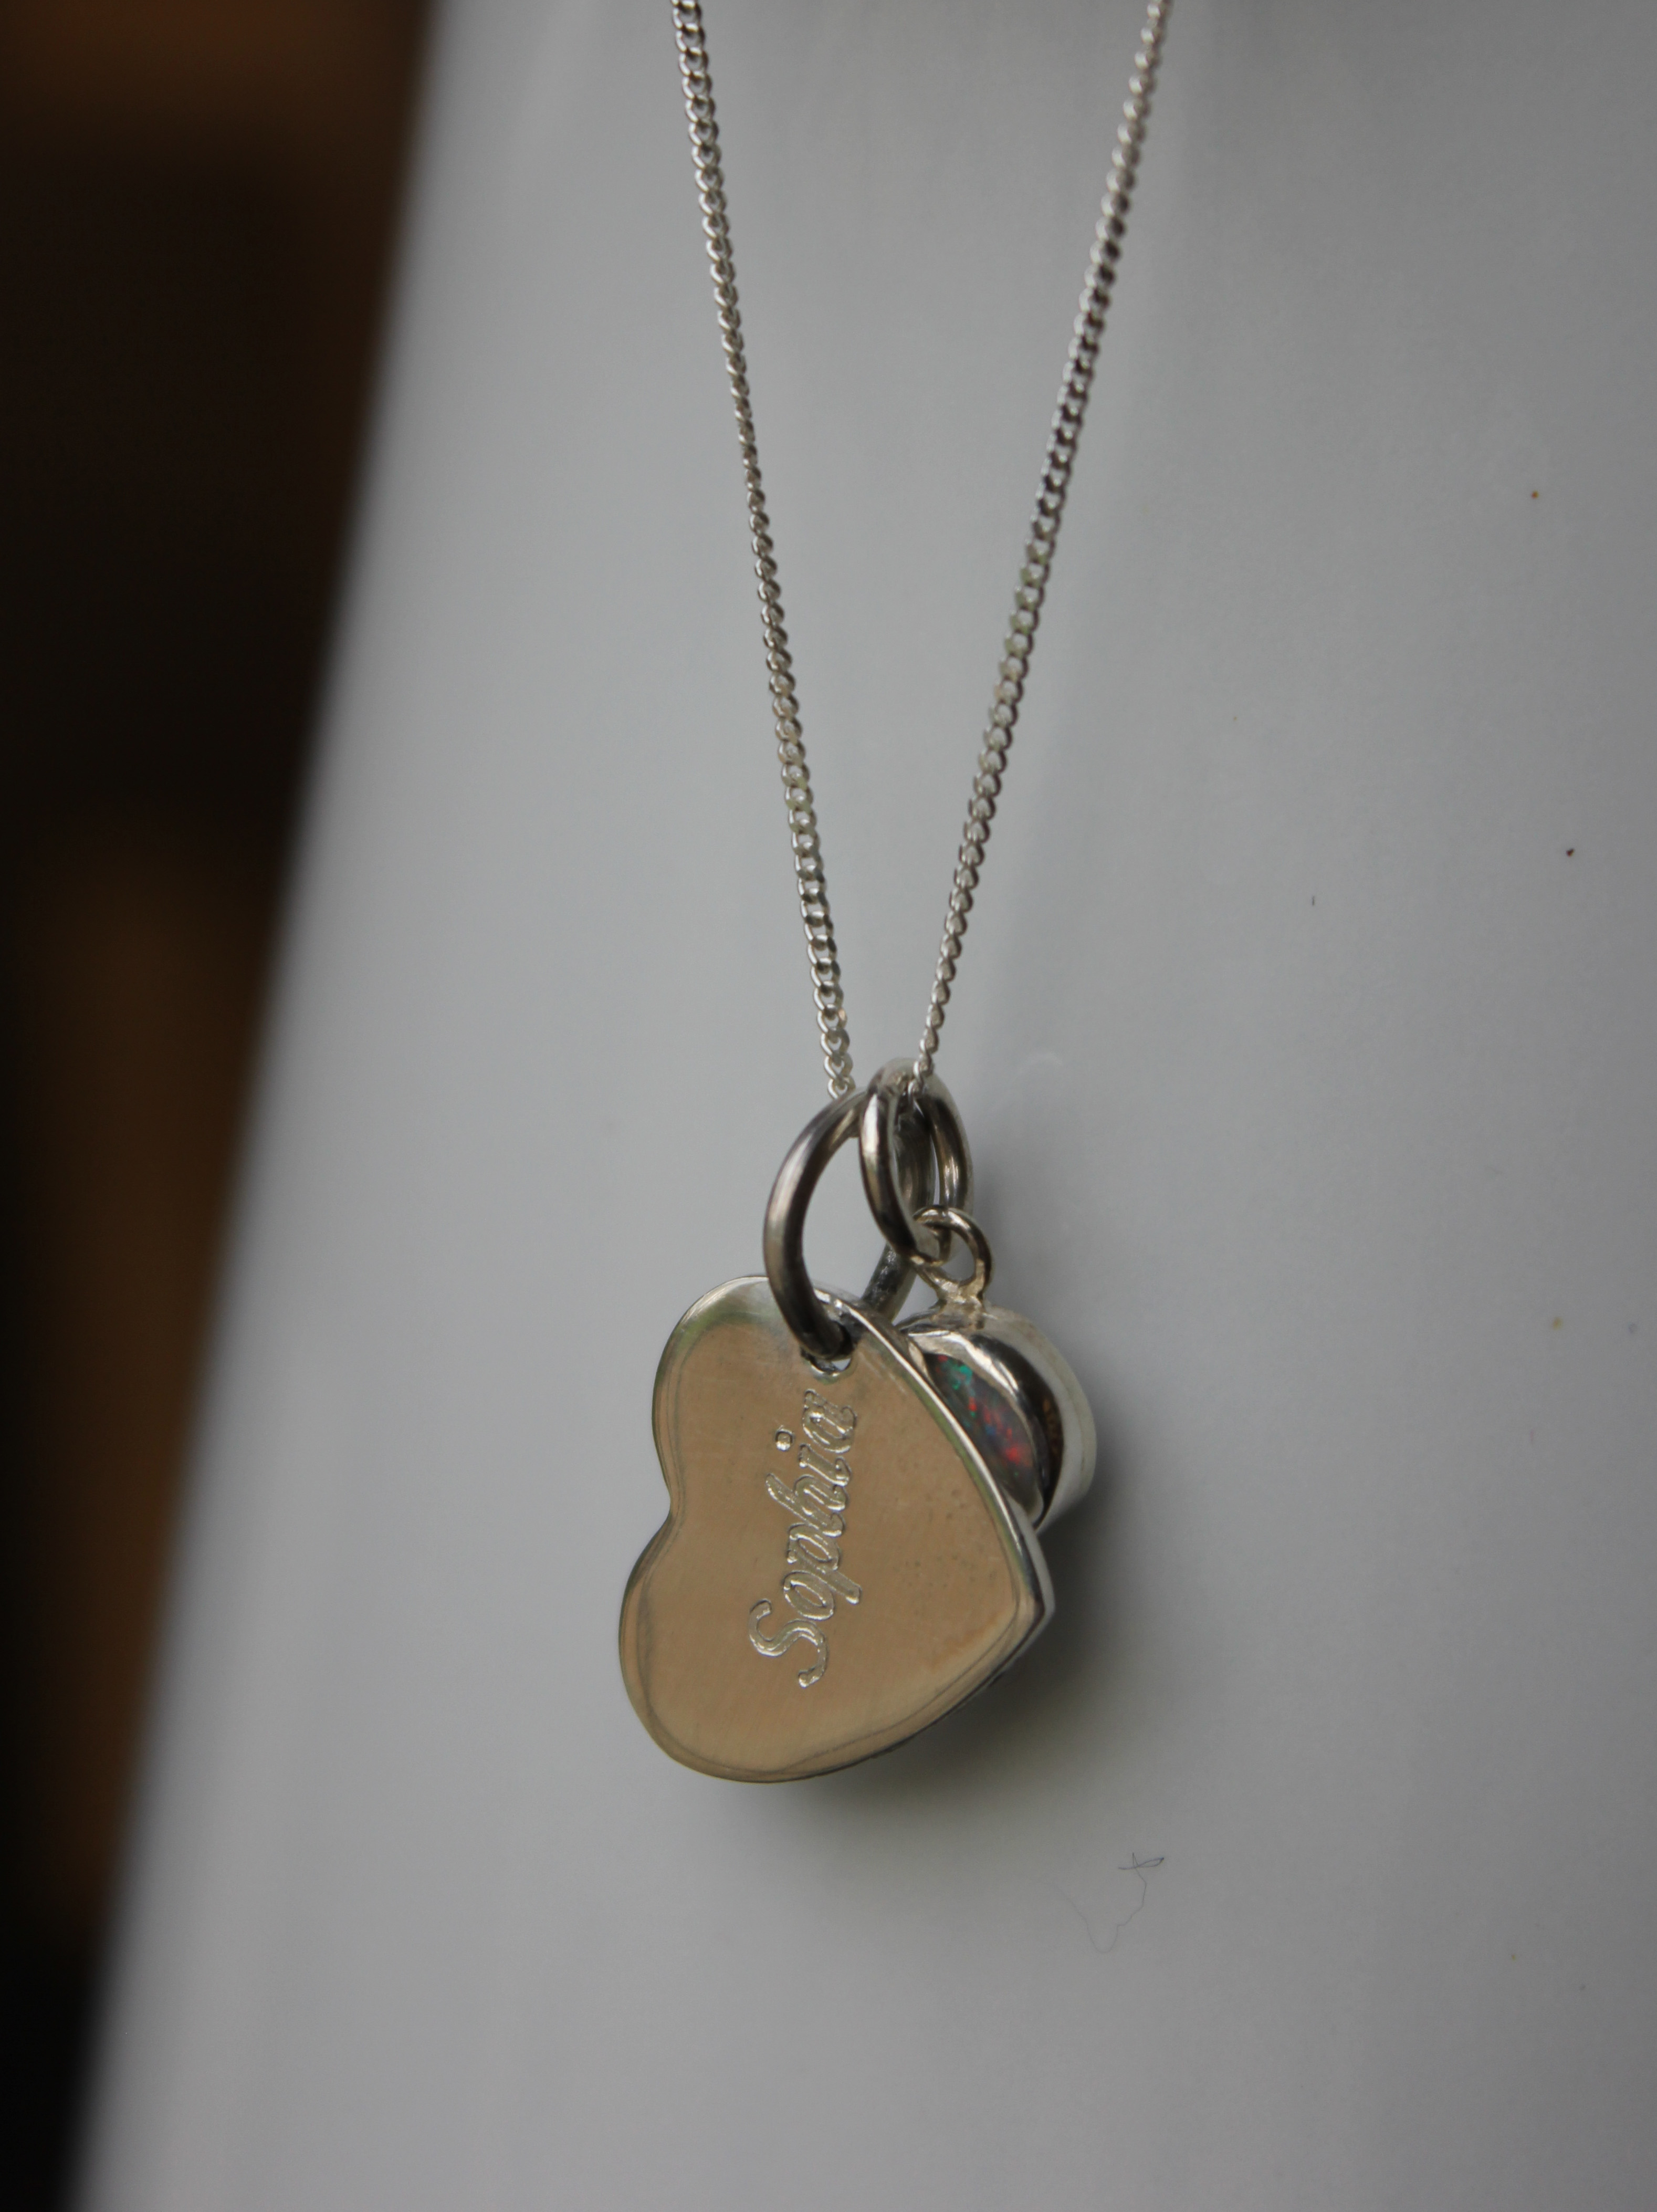 B-Jewellery birthstone pendan2t